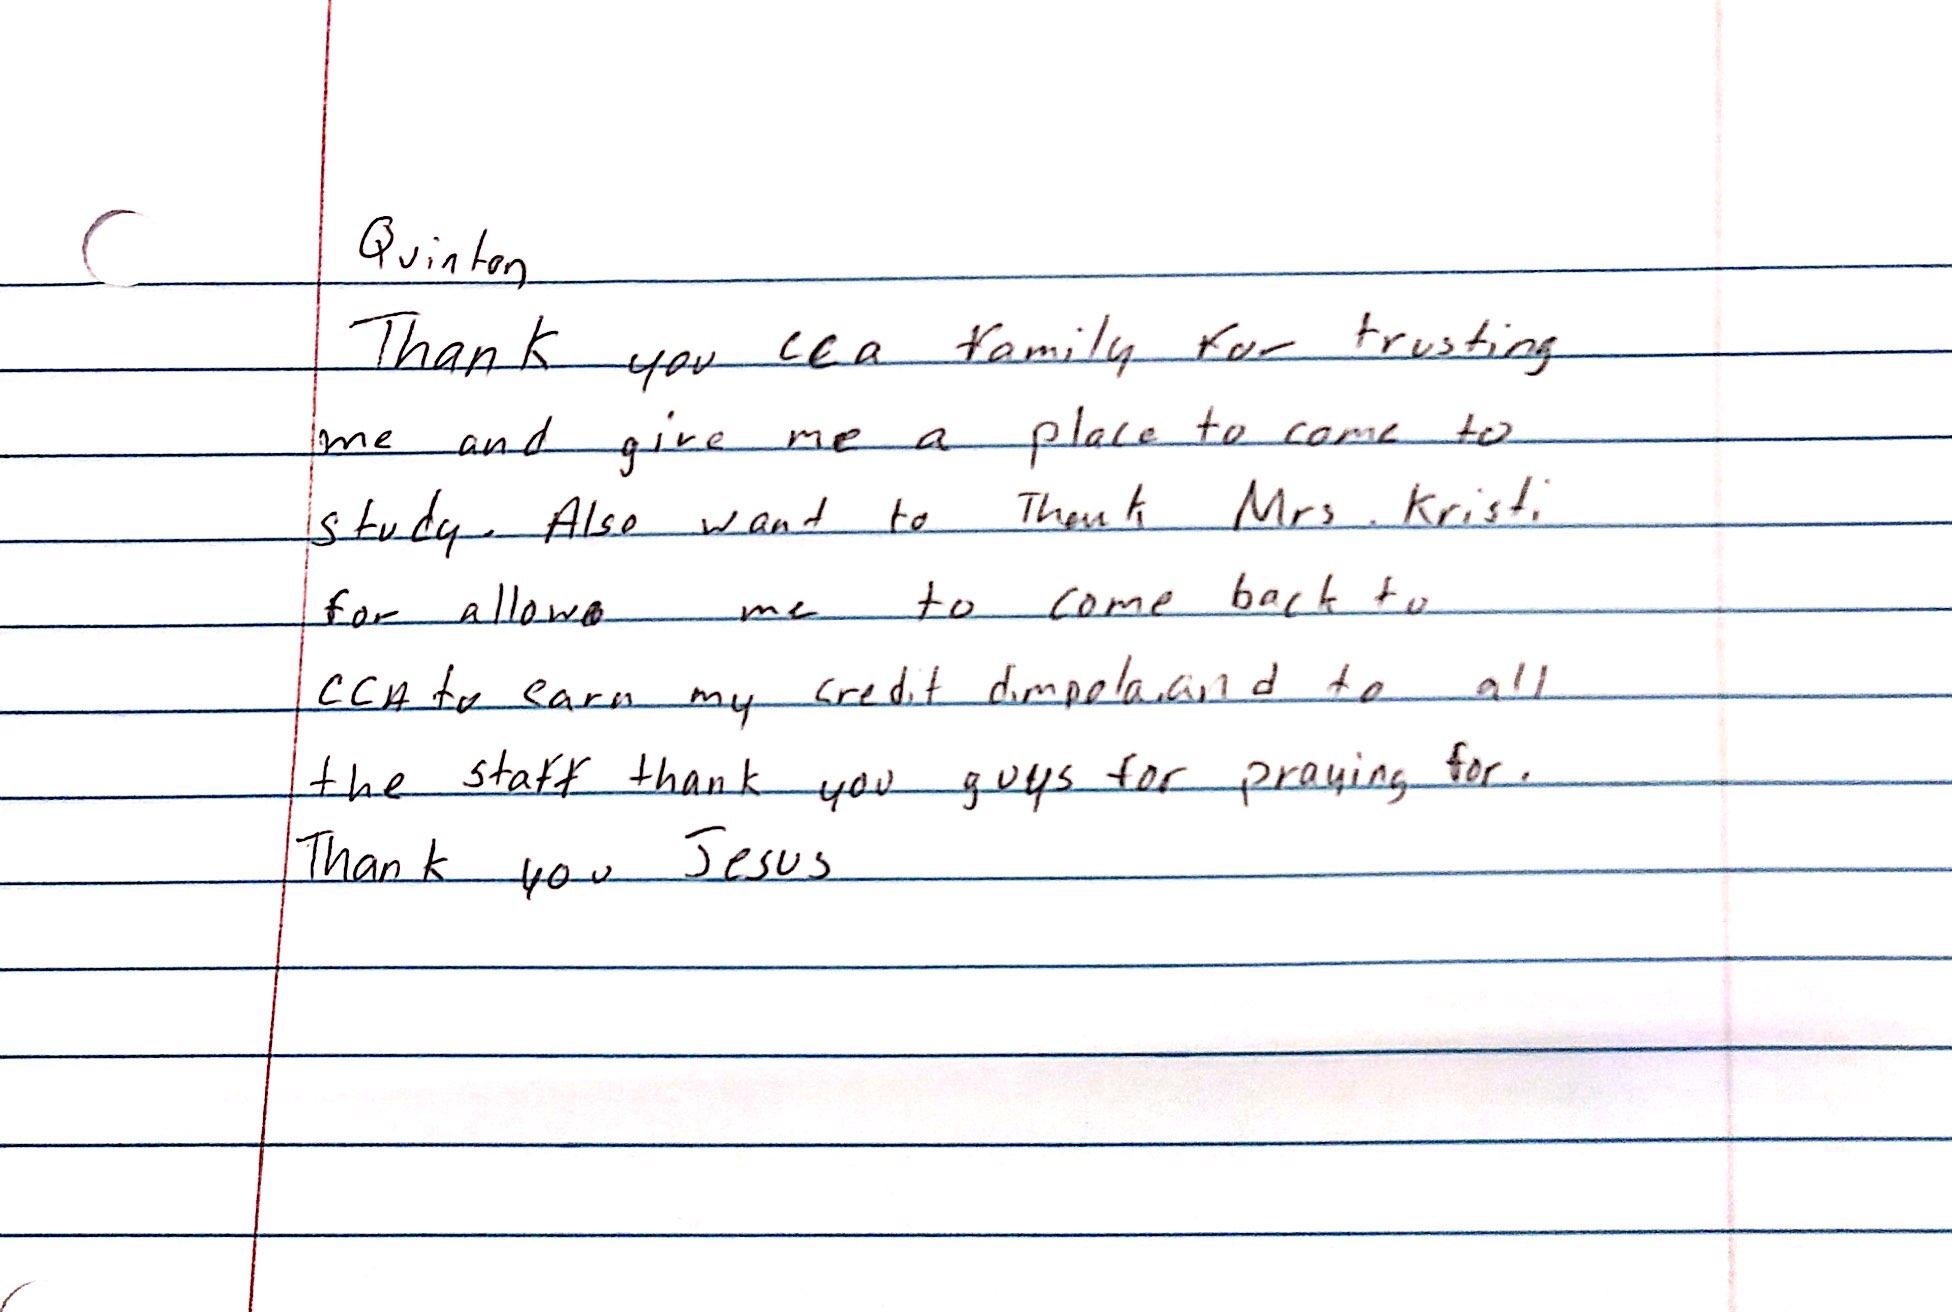 Quinton Thank You Letter.jpg